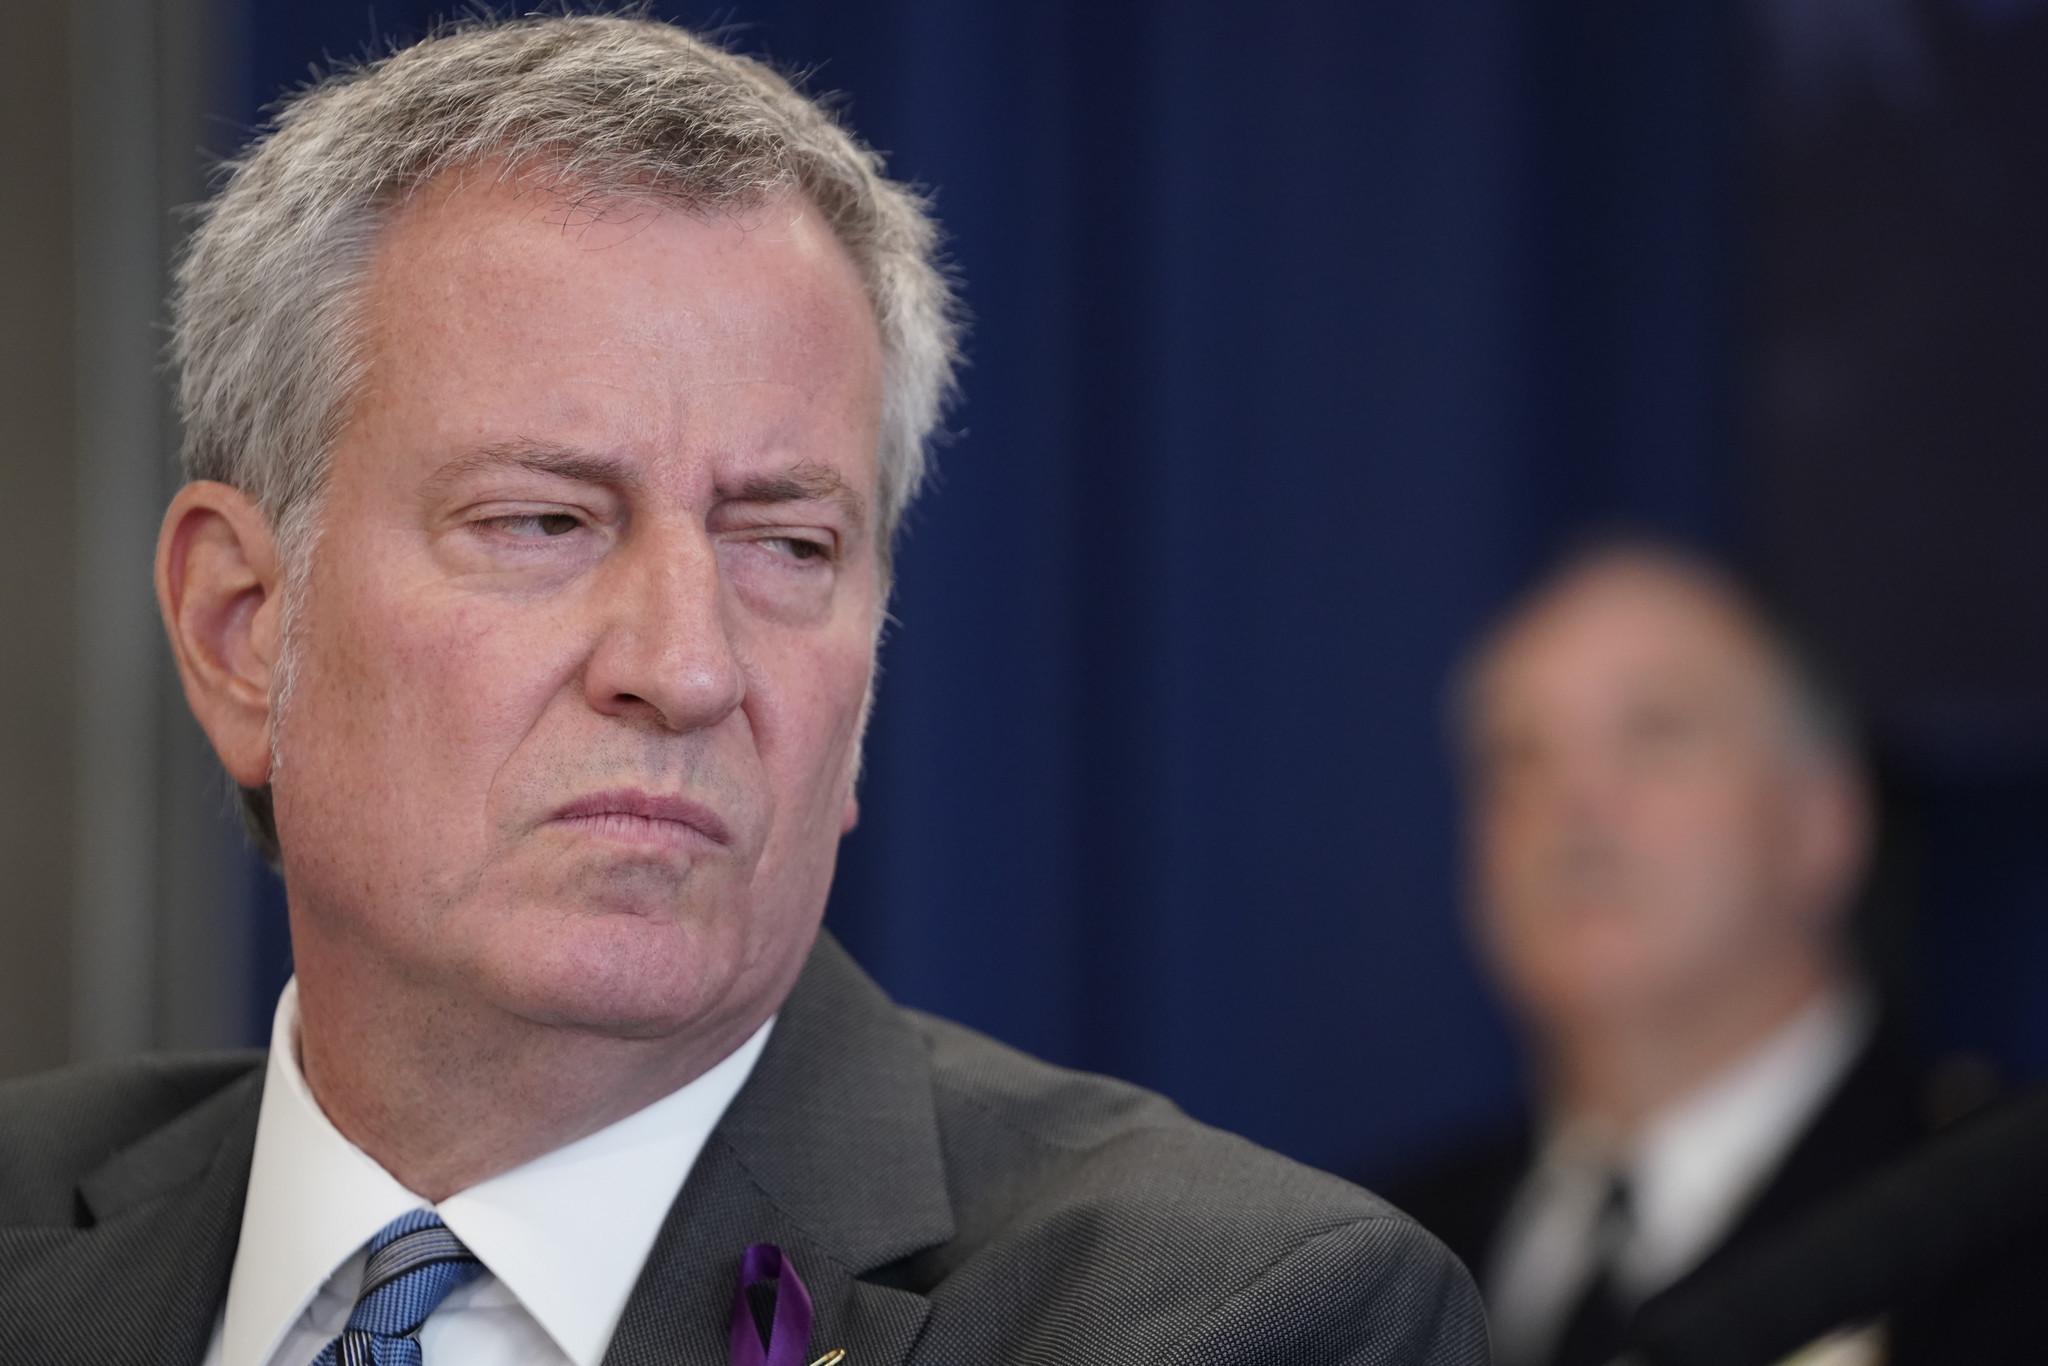 NYC Mayor de Blasio blasts coronavirus response from CDC and Trump administration as 'malpractice'